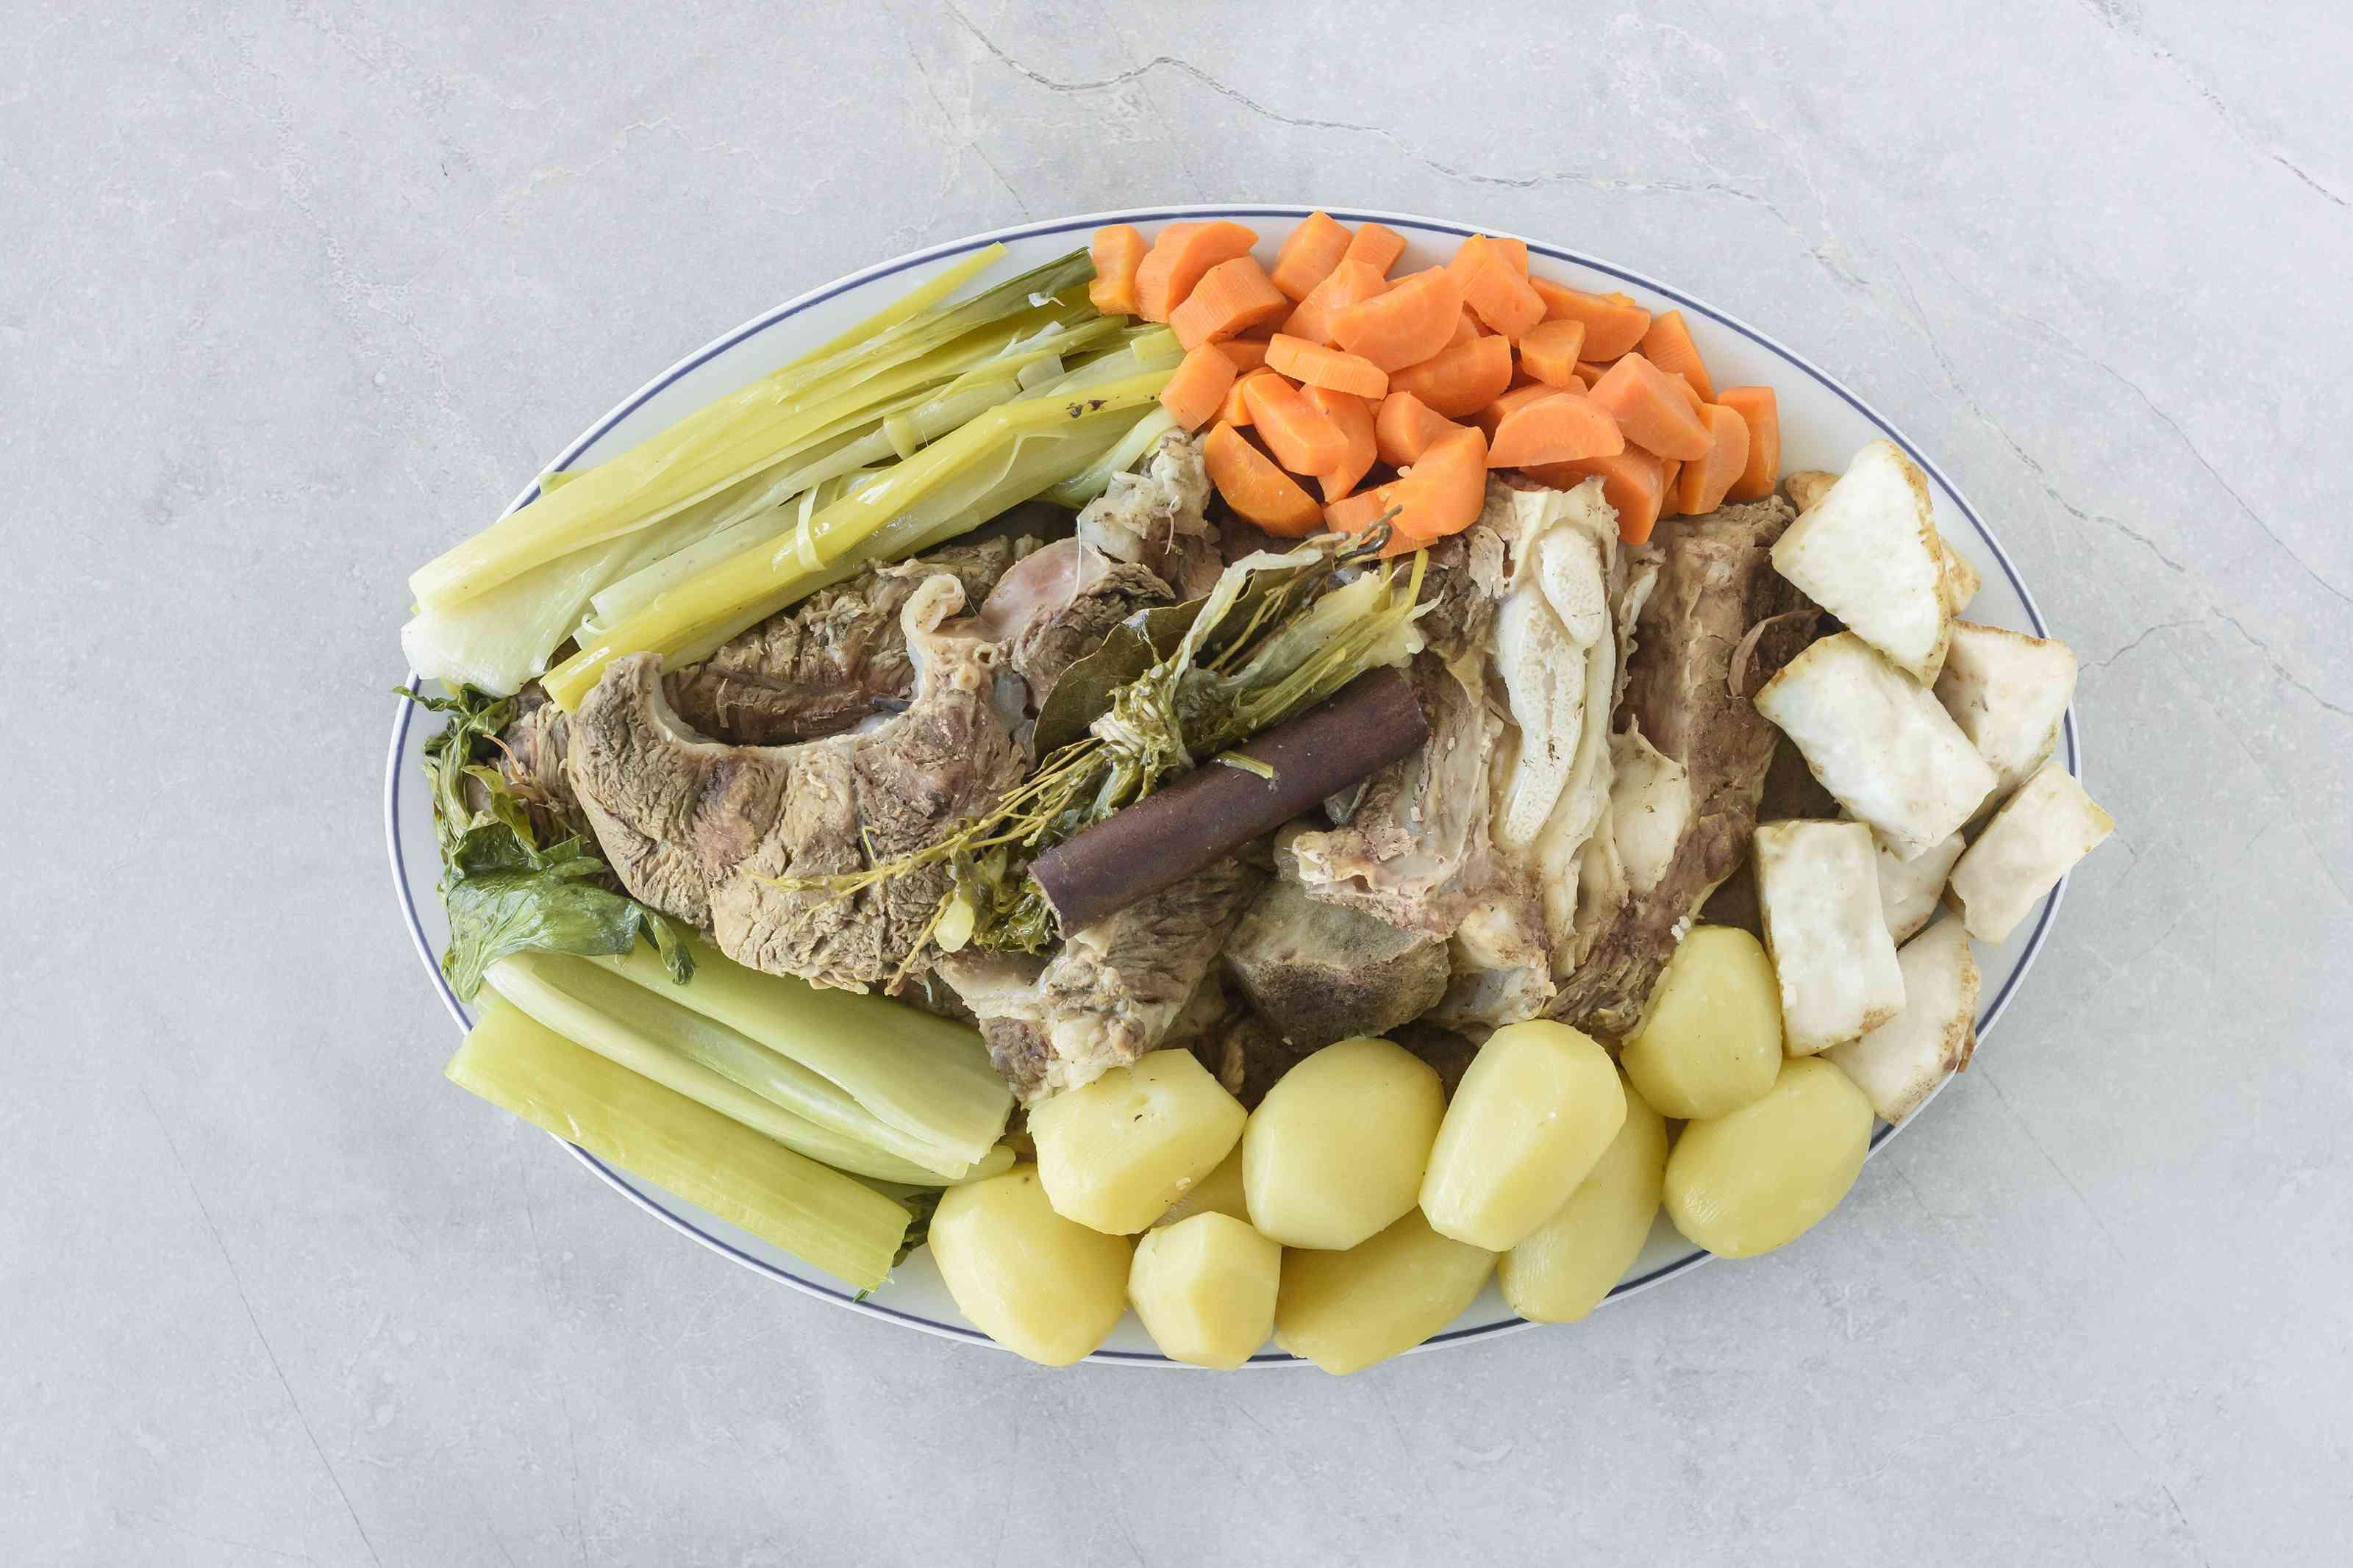 Remove each vegetable